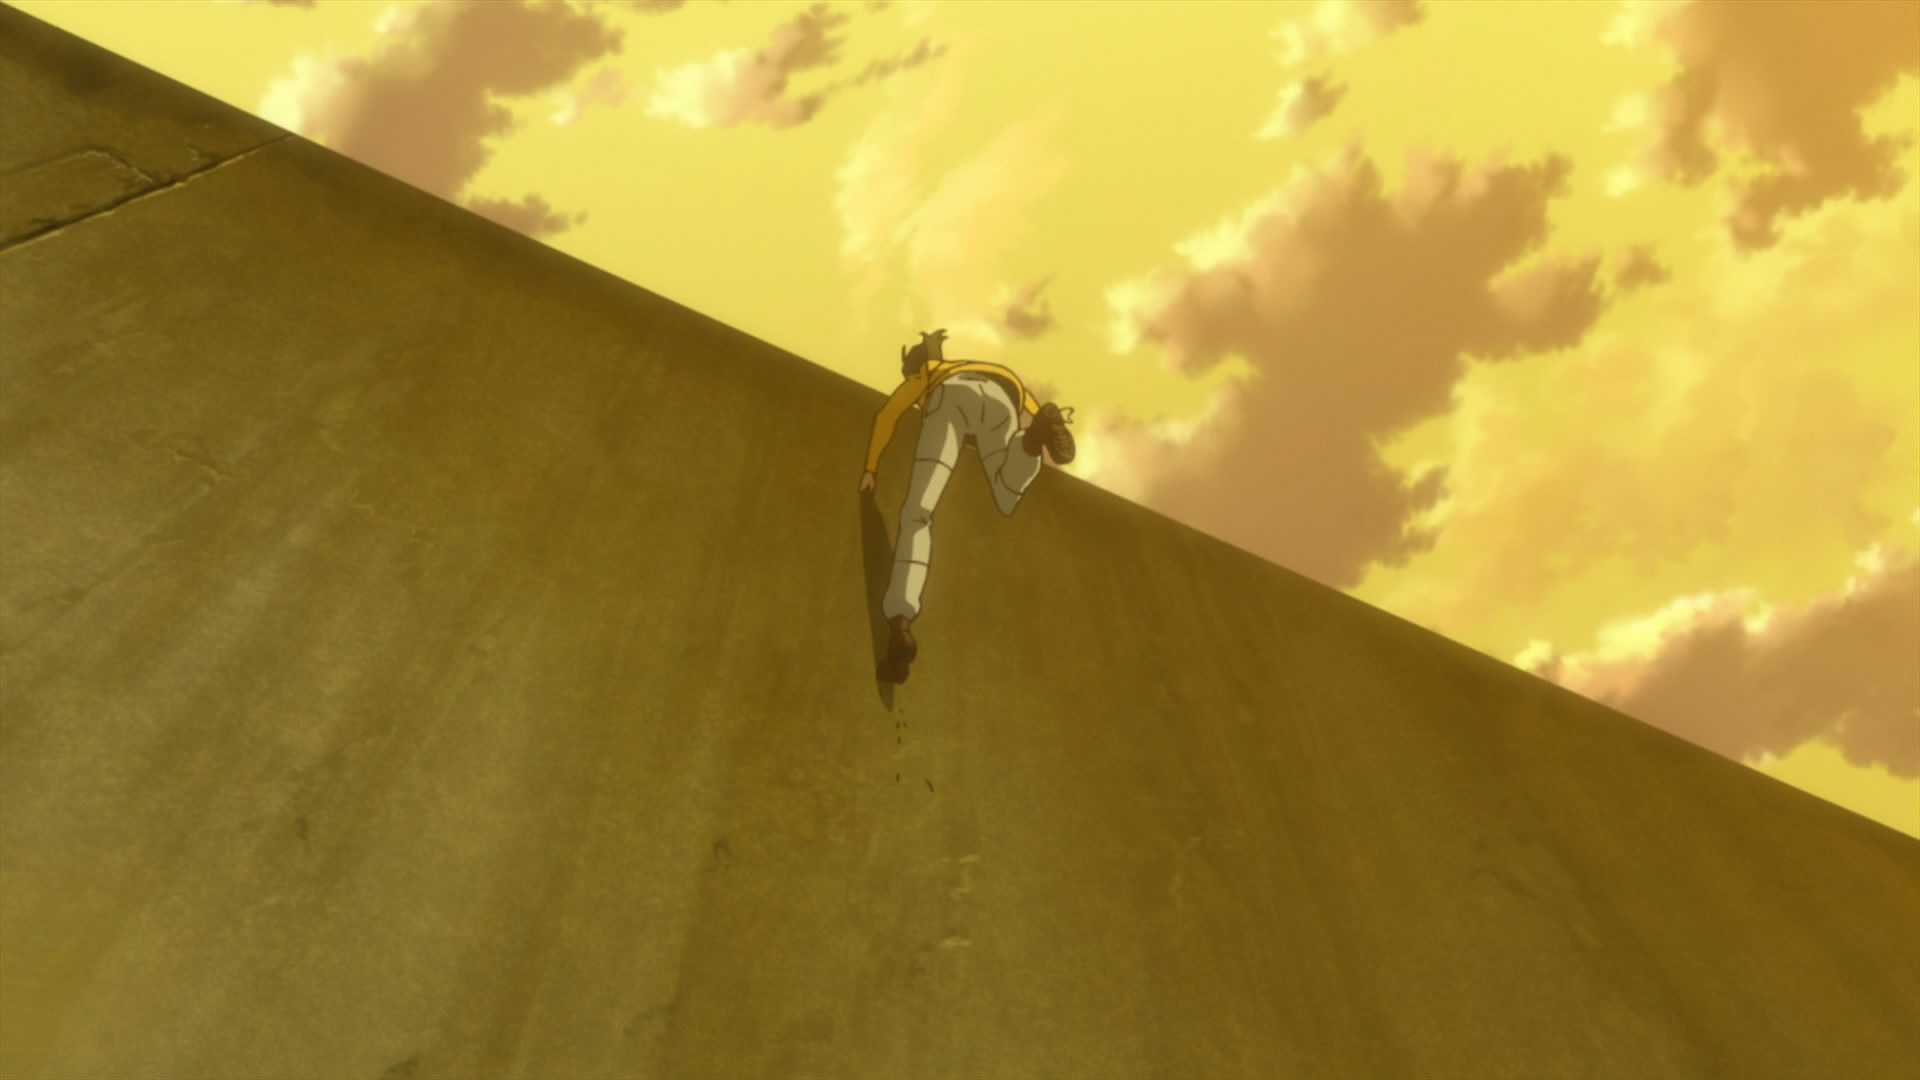 [gSS]_Mobile_Suit_Gundam_00_-_A_wakening_of_the_Trailblazer_(1080p)_[2B252856].mkv_snapshot_00.36.31_[2011.01.07_04.22.58]